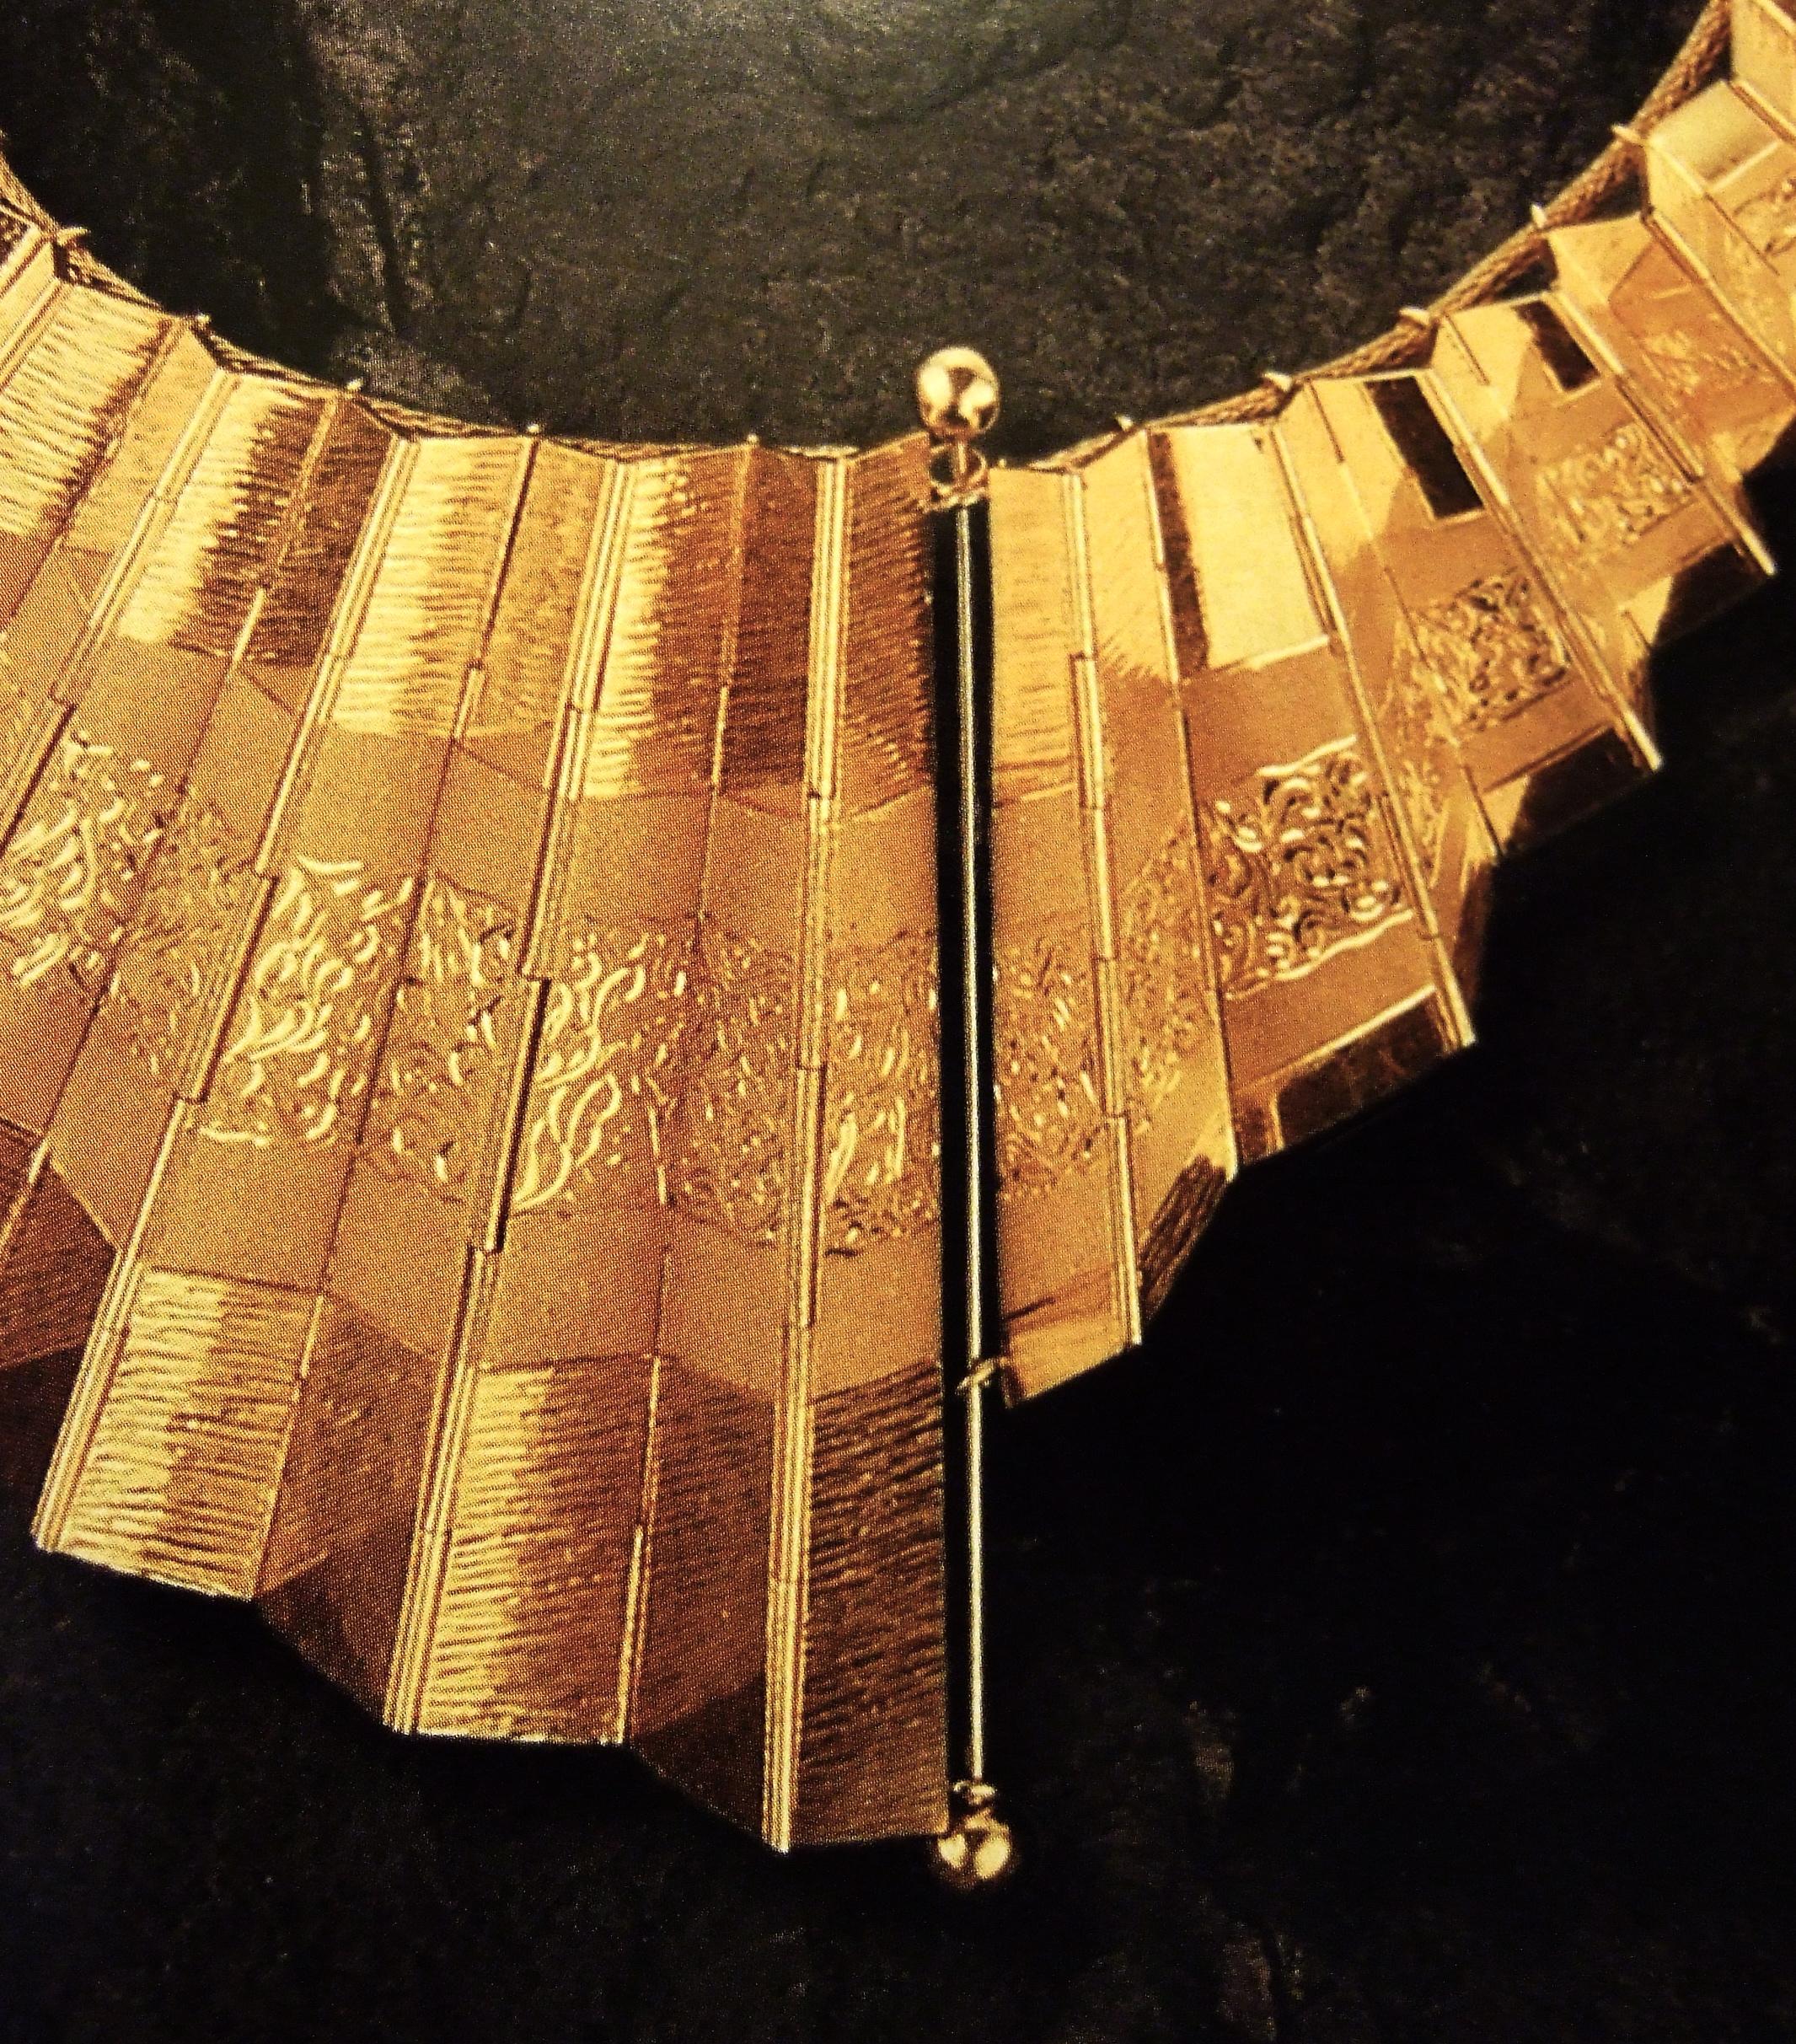 Reena Ahluwalia-Concertina Gold Necklace1.JPG